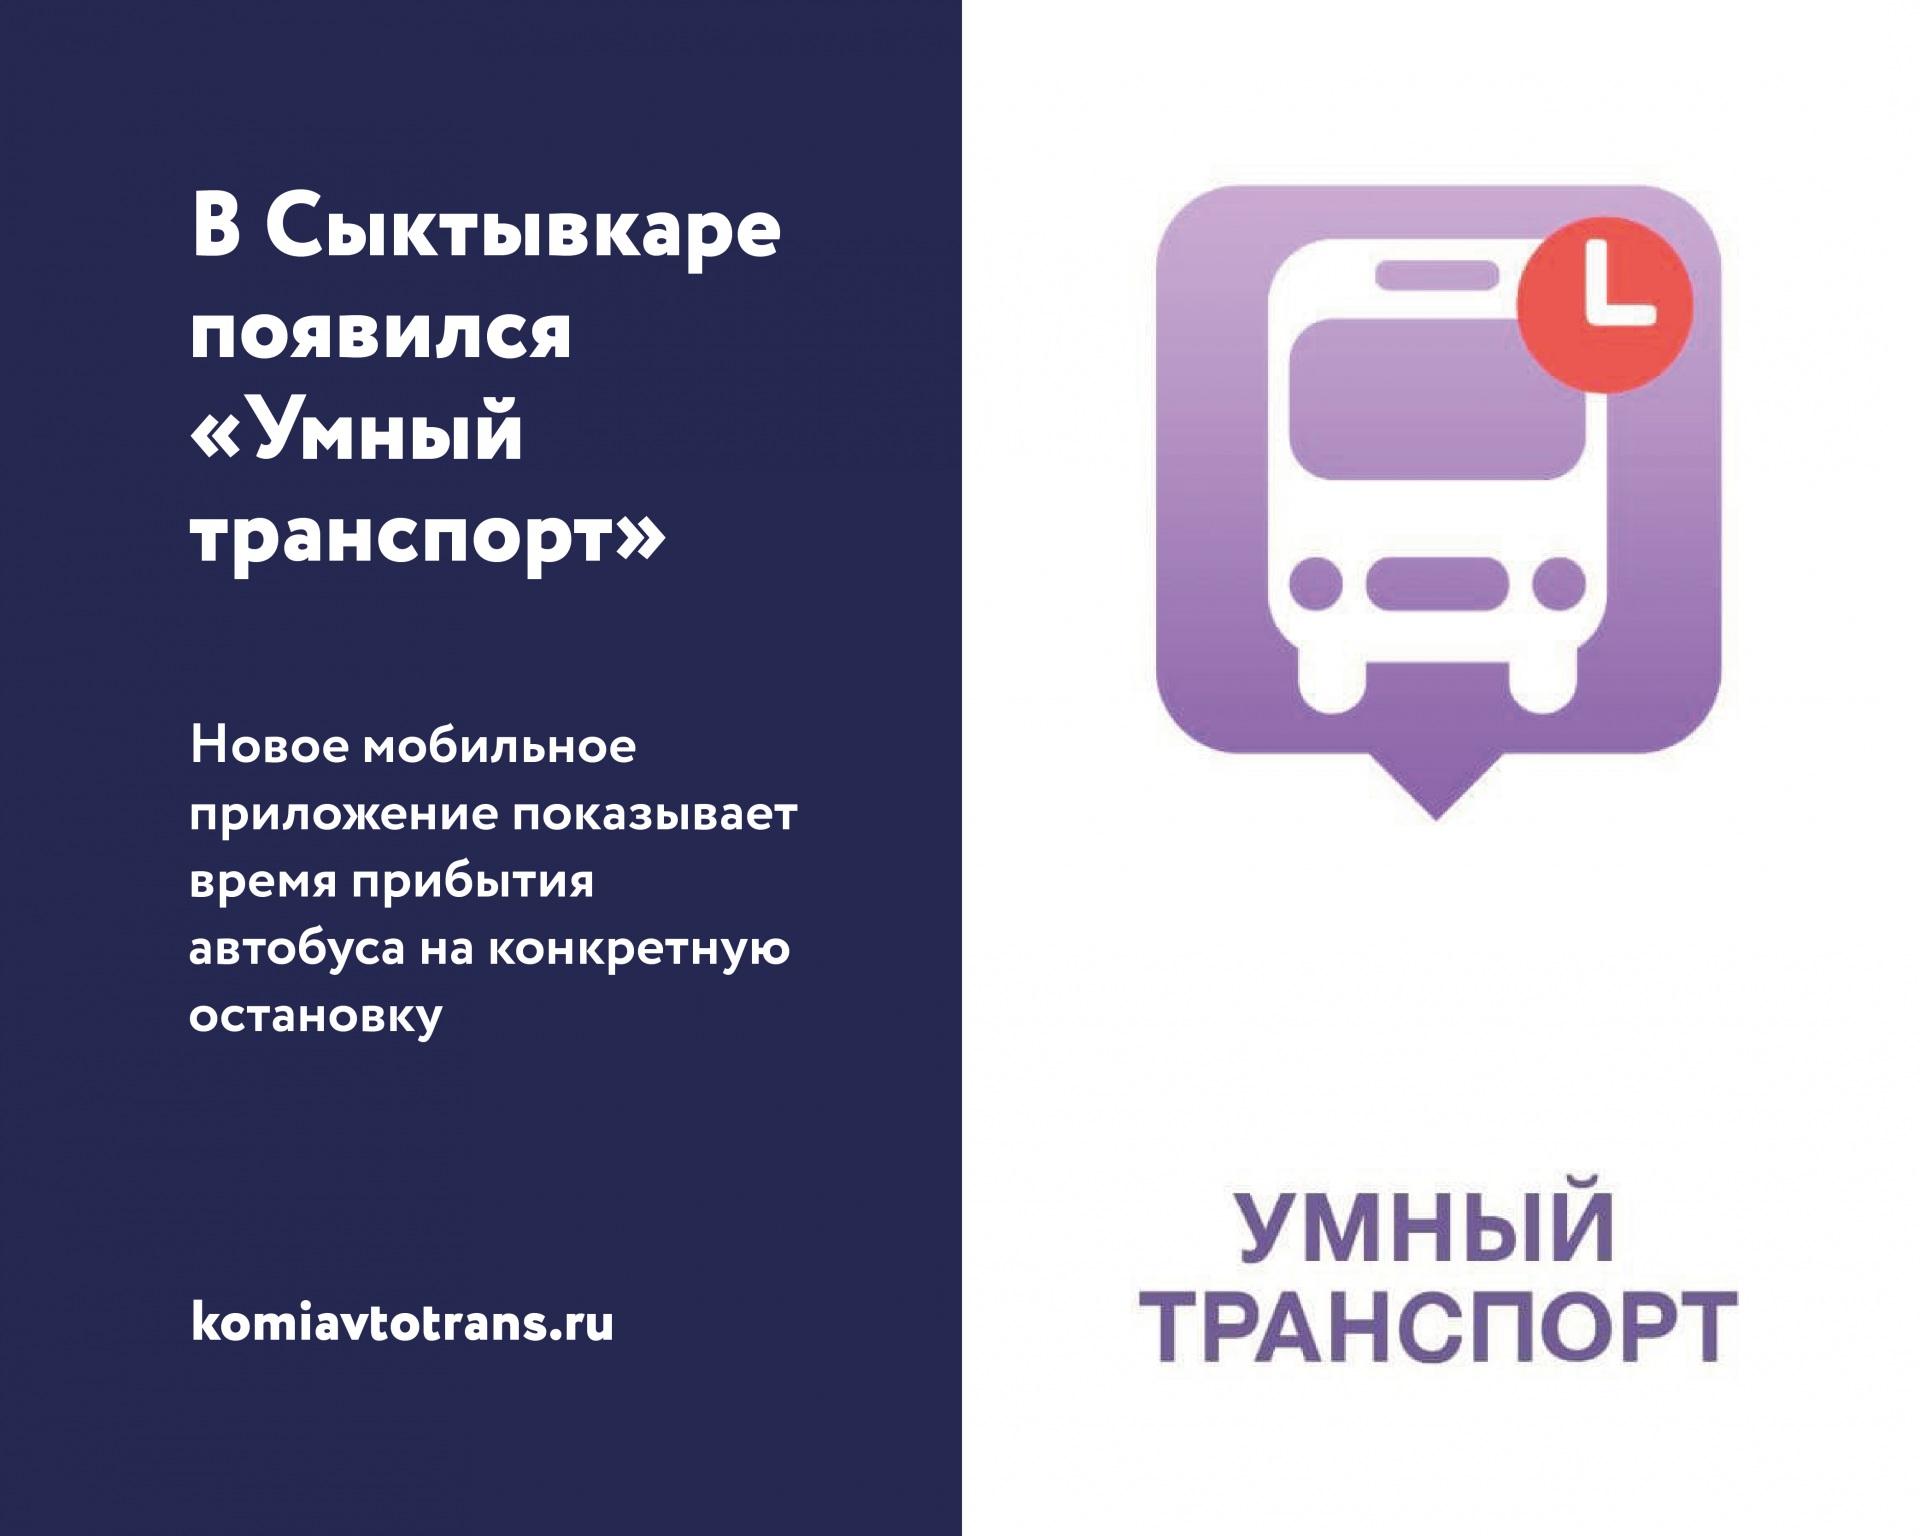 Umnyi-transport-01.jpg